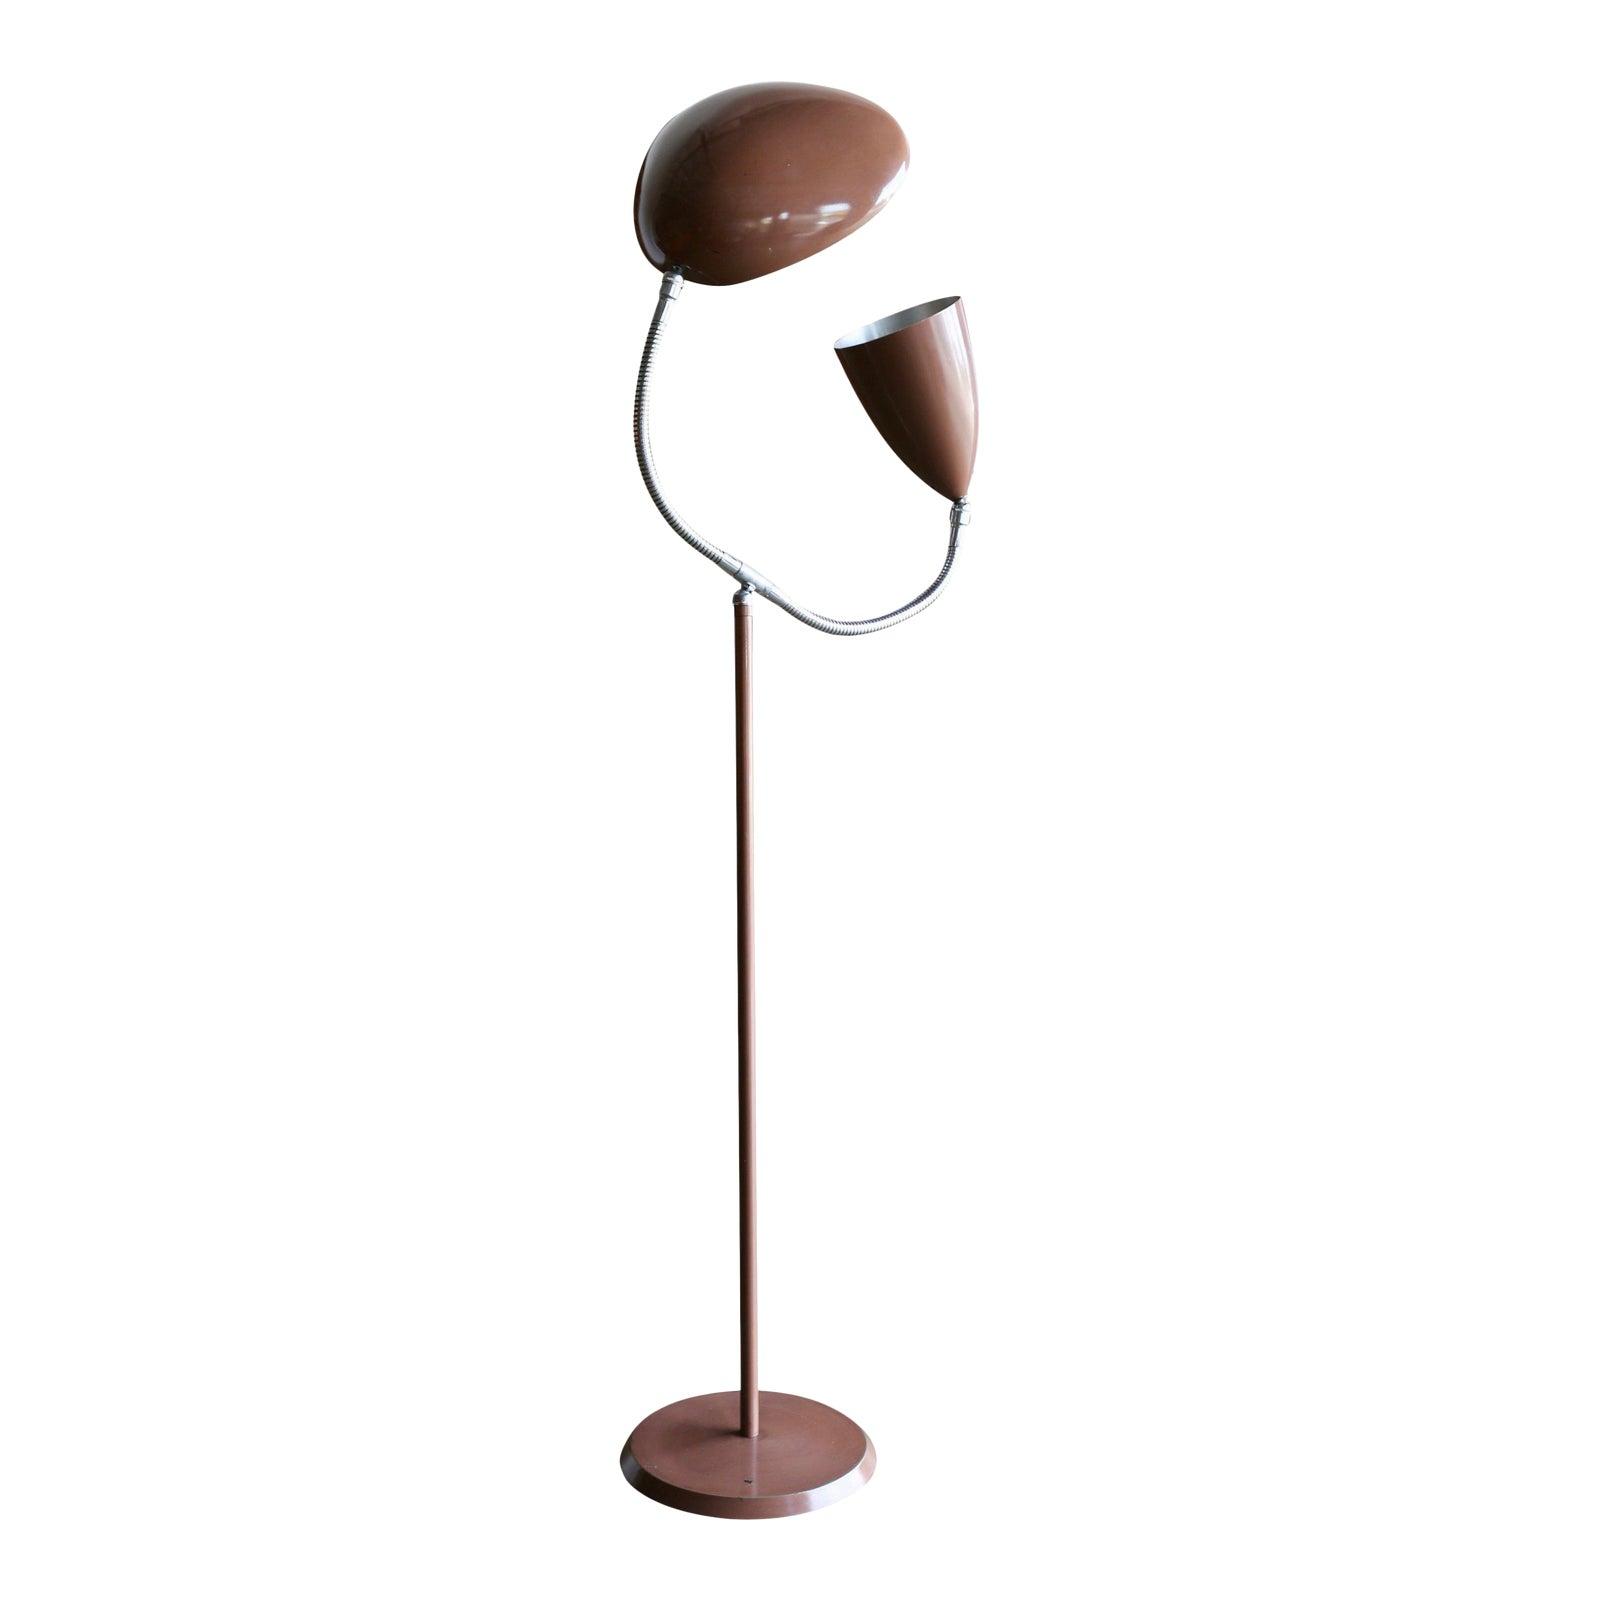 Greta Grossman Greta Grossman Double Shade Floor Lamp